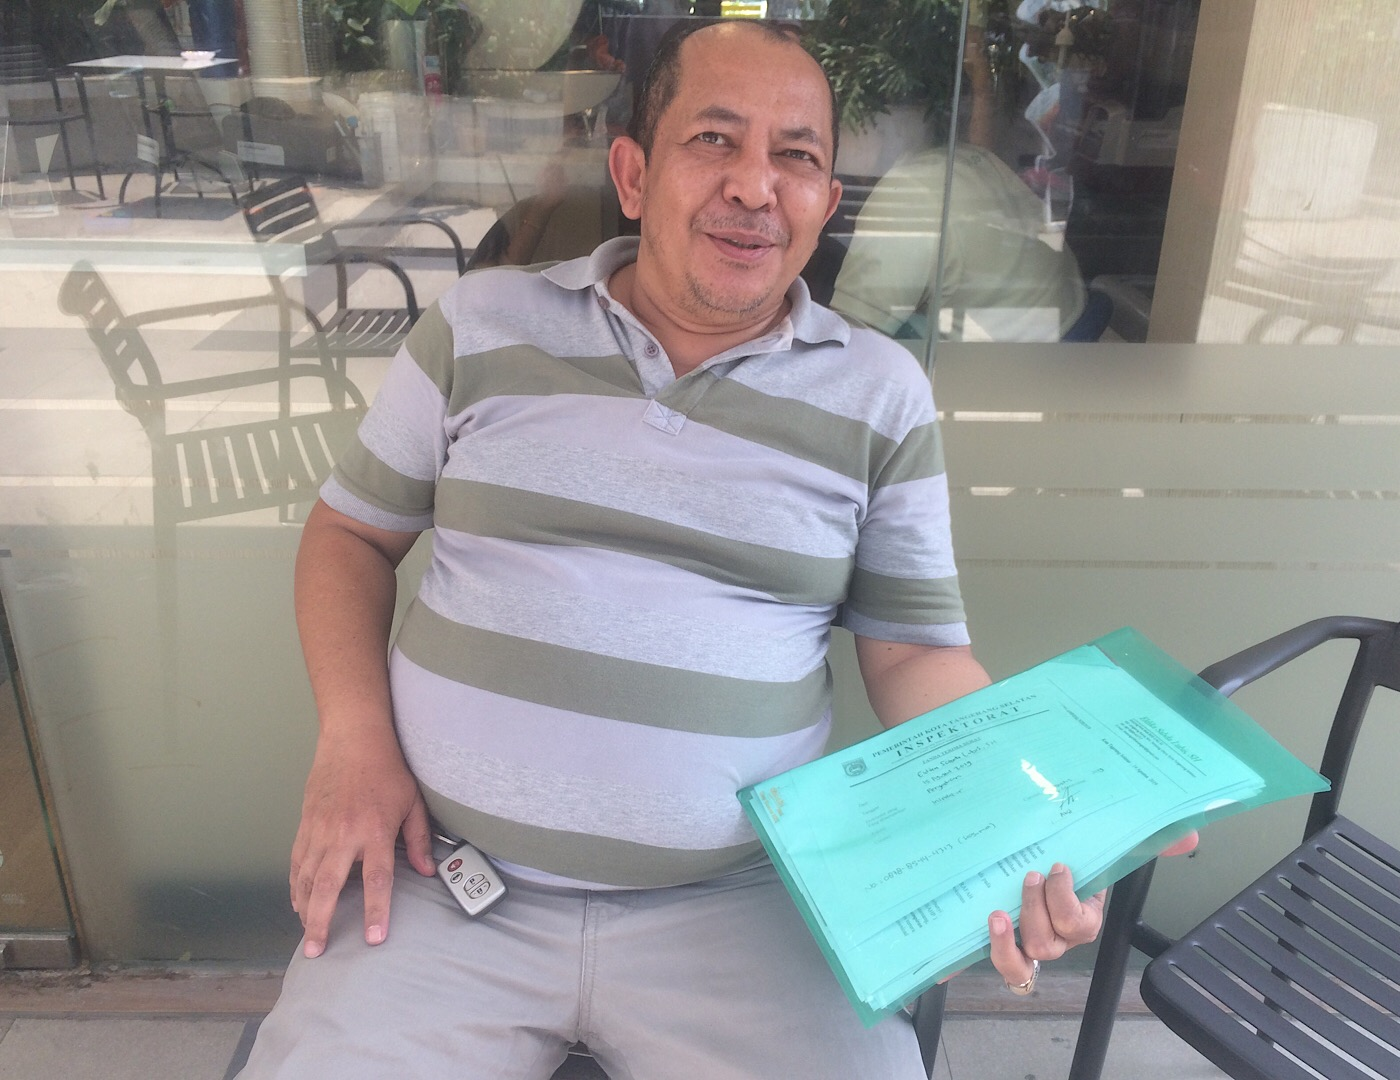 Disinyalir Jadi Bancakan, Pengadaan Barang dan Jasa di Tangsel Bakal Dilaporkan ke TP4D